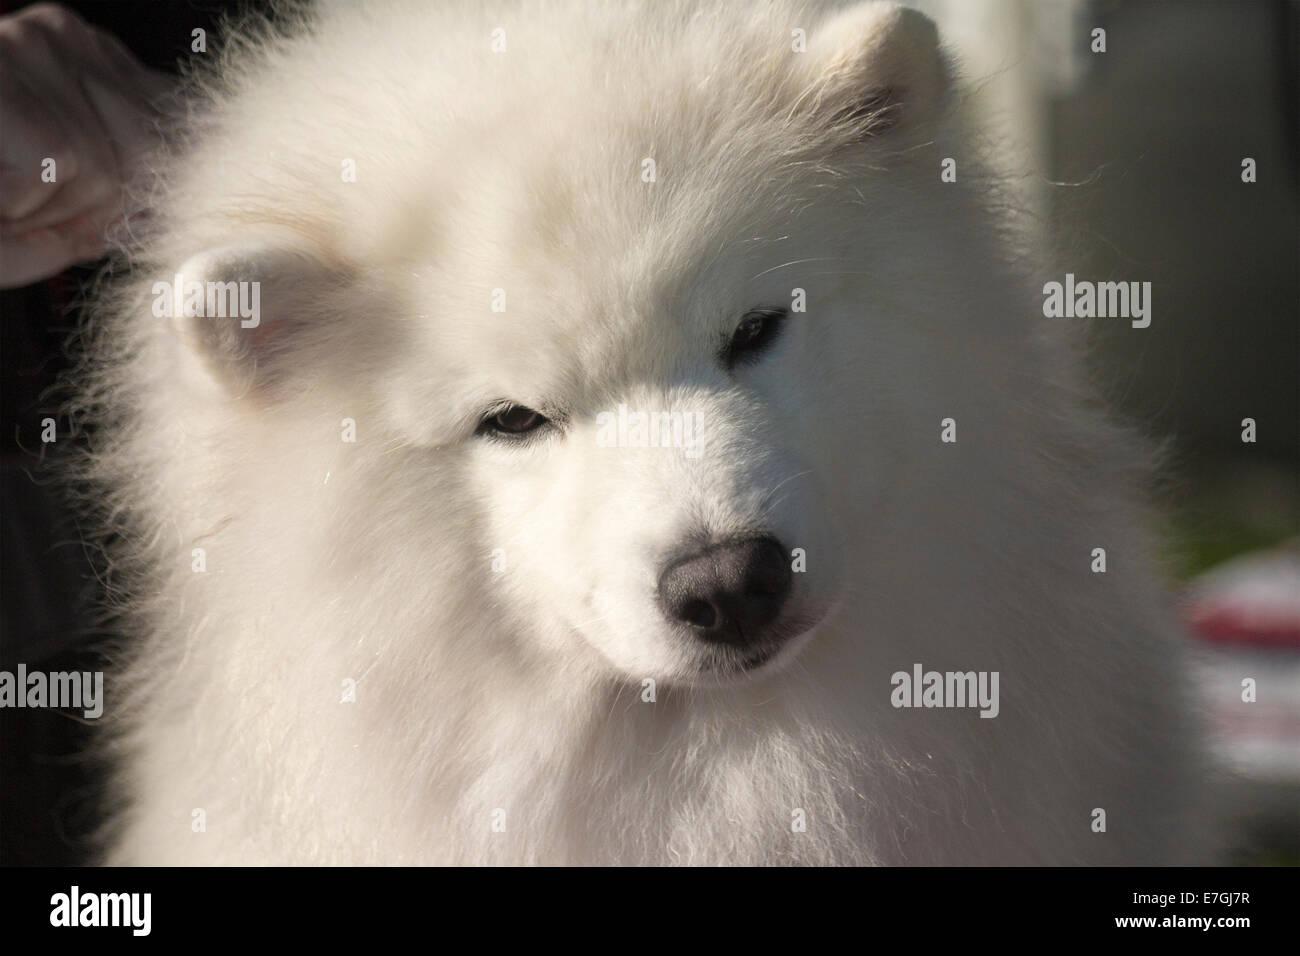 close-up-of-samoyed-dog-being-prepared-f